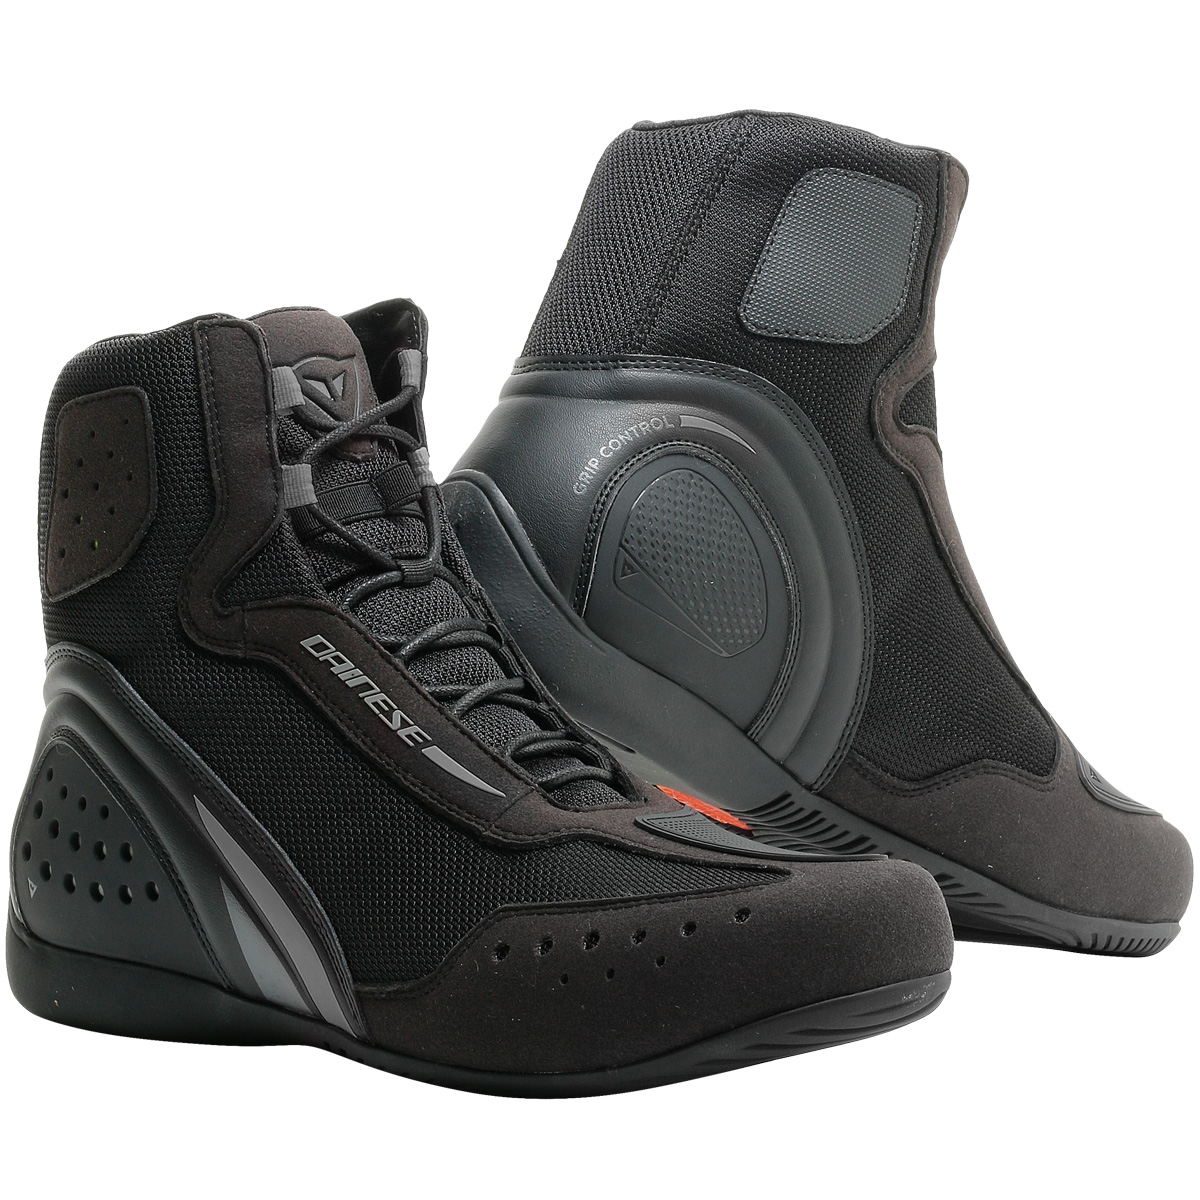 Botas DAINESE Motorshoe D1 Air Black / Black / Anthracite